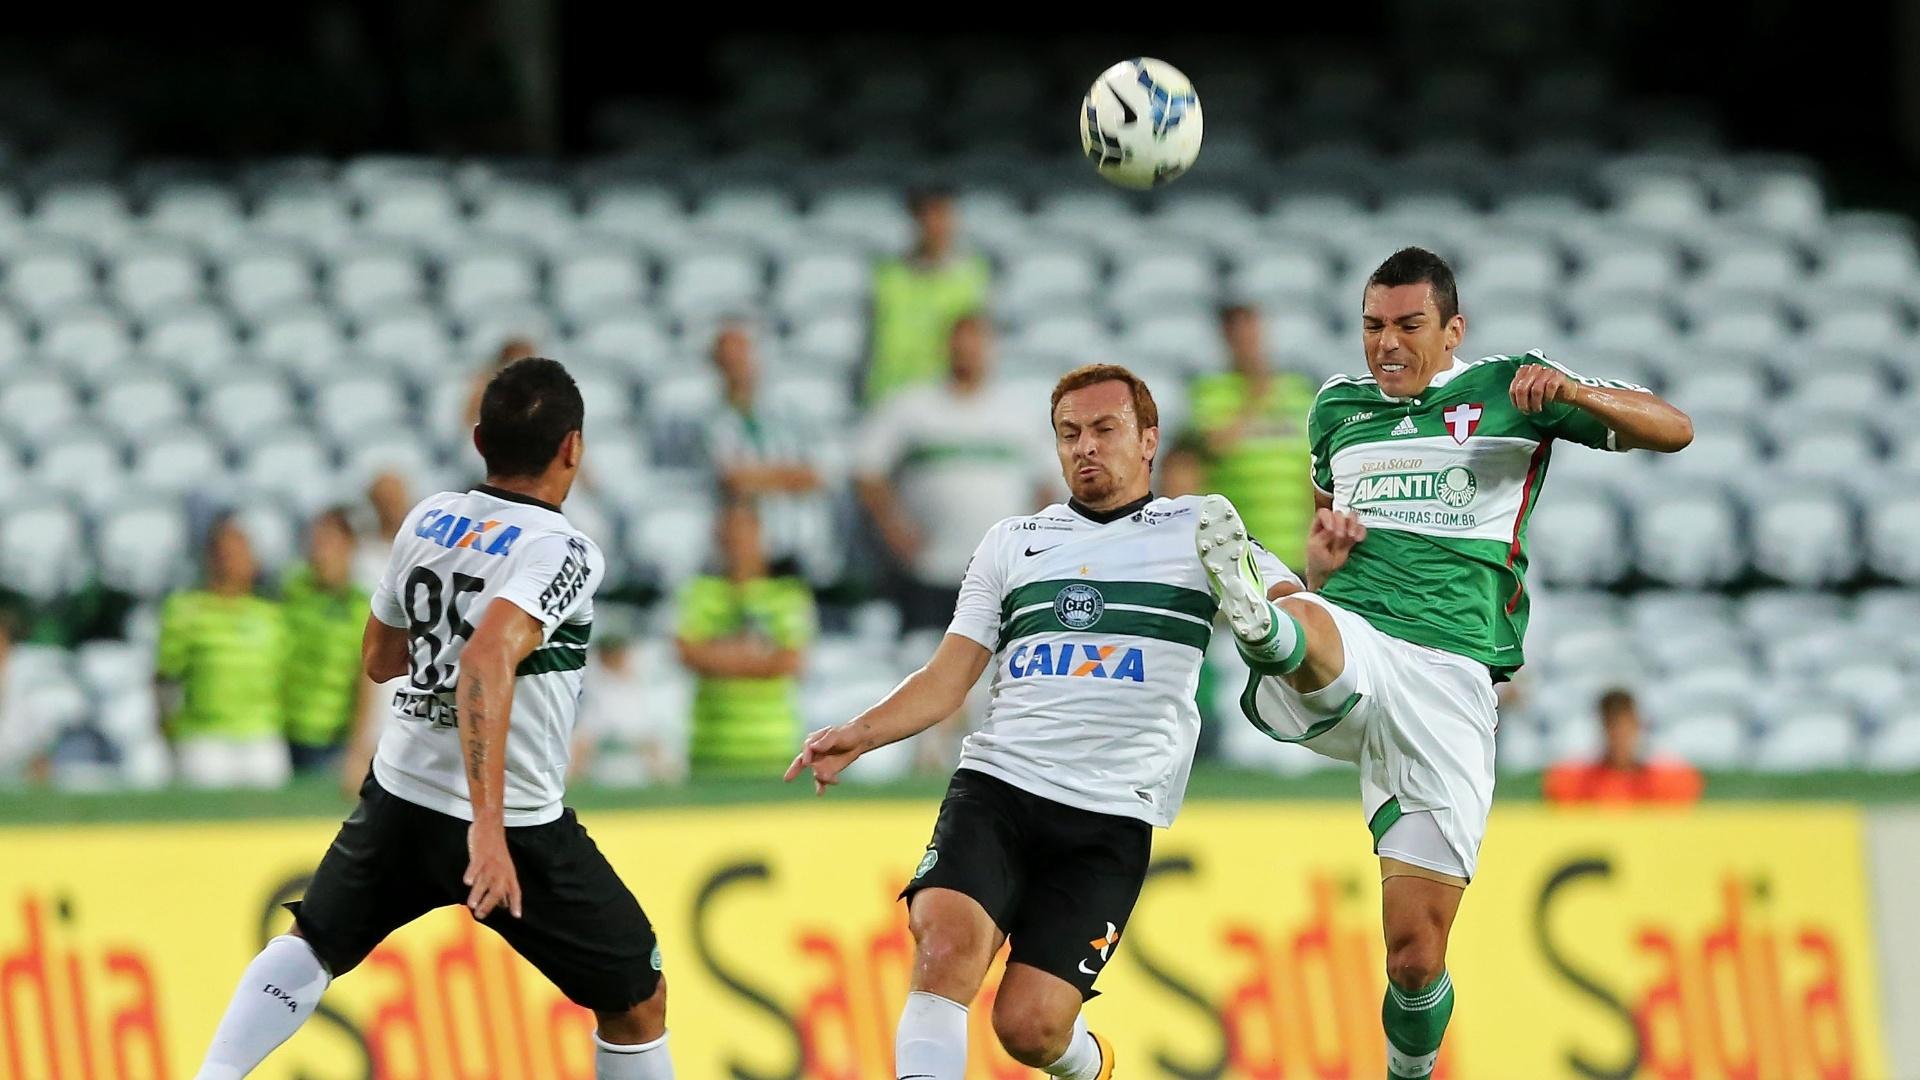 Zé Love, do Coritiba, sobe de cabeça junto com zagueiro Lúcio, do Palmeiras